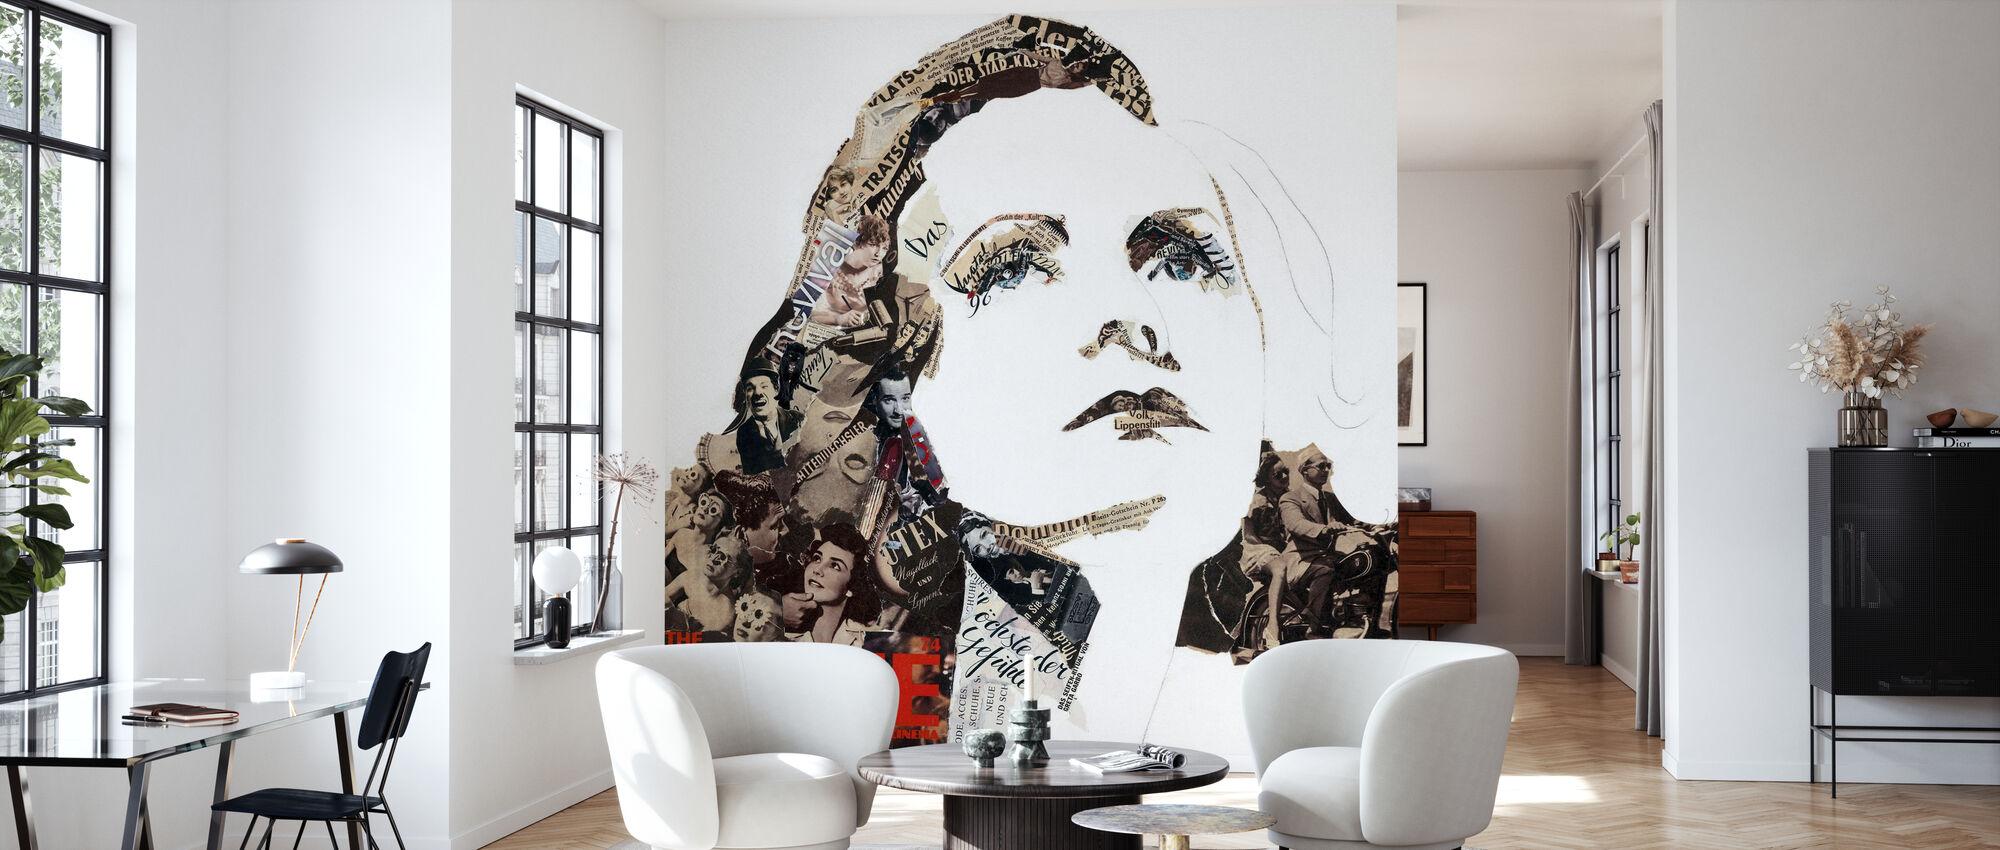 Greta - Wallpaper - Living Room